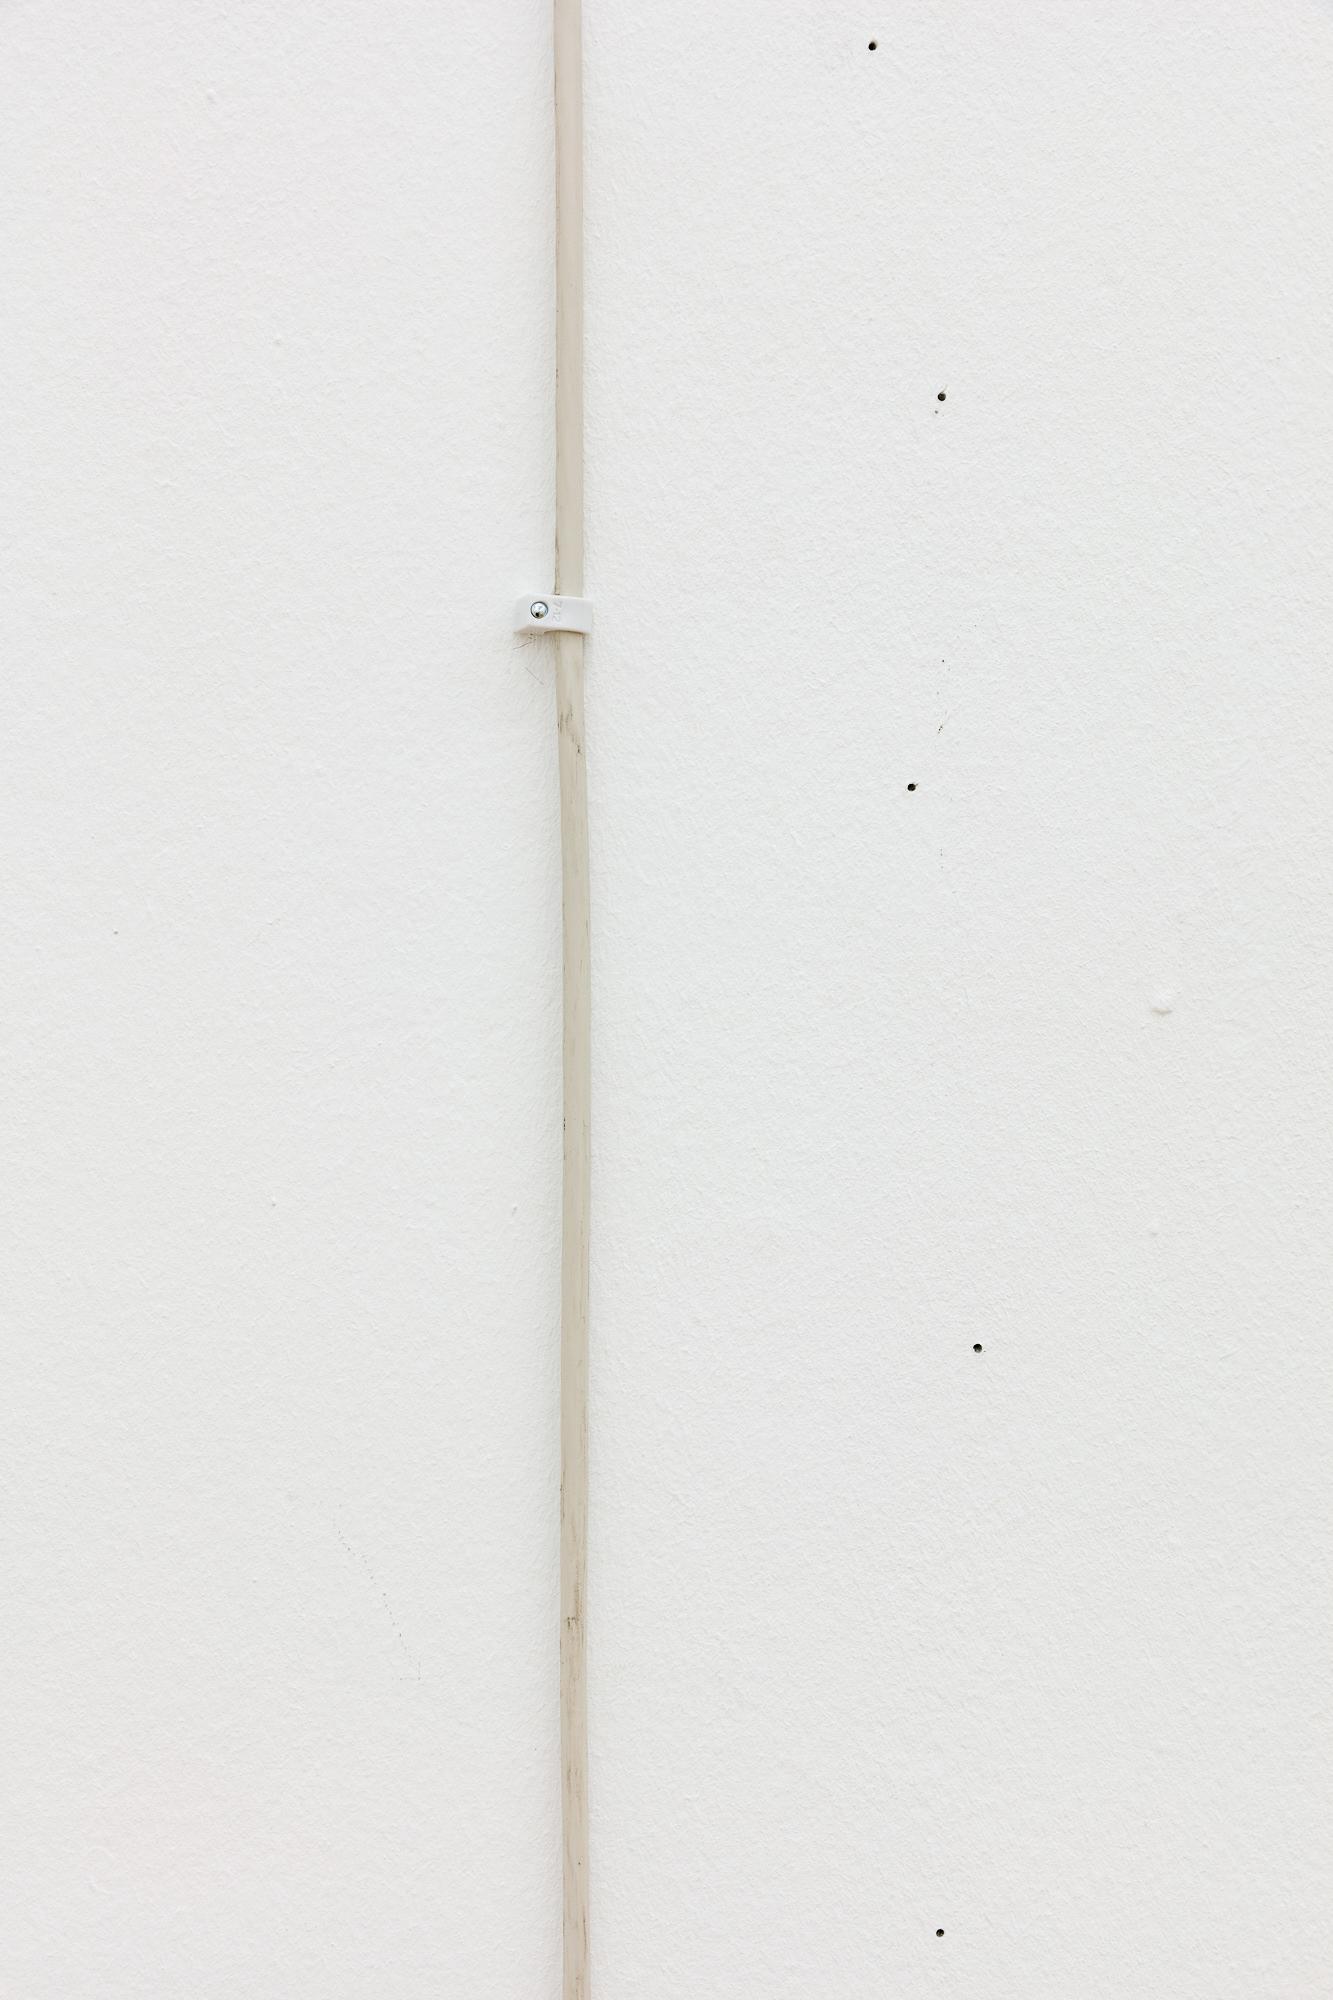 2018_11_08_Vera Lutz at Felix Gaudlitz_by kunst-dokumentation.com_012_web.jpg